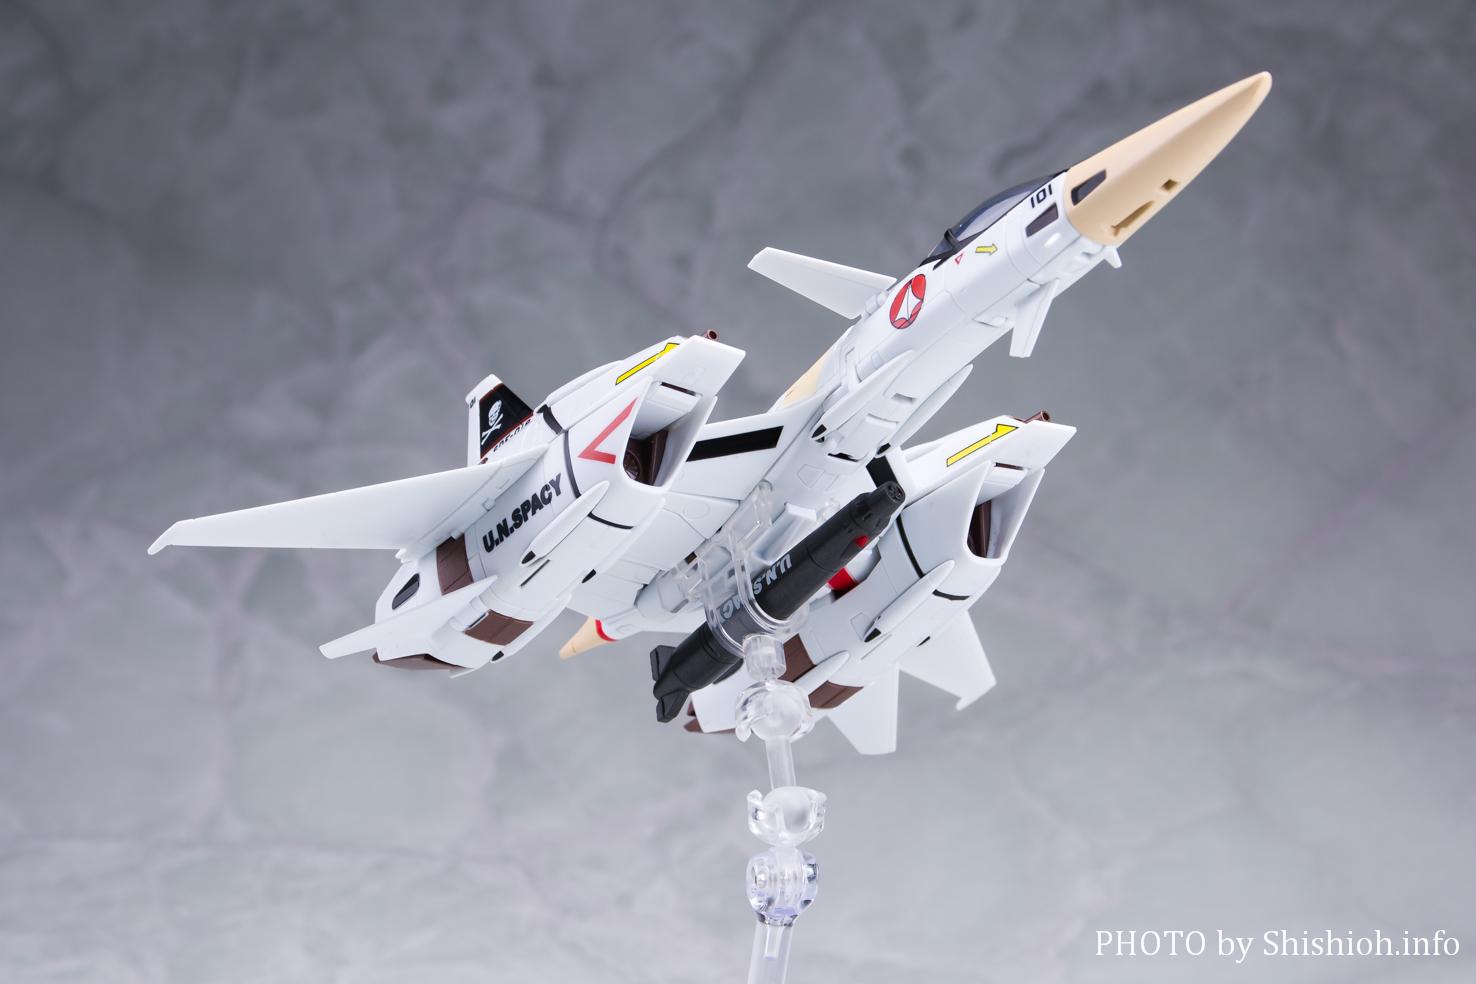 HI-METAL R VF-4 ライトニングIII